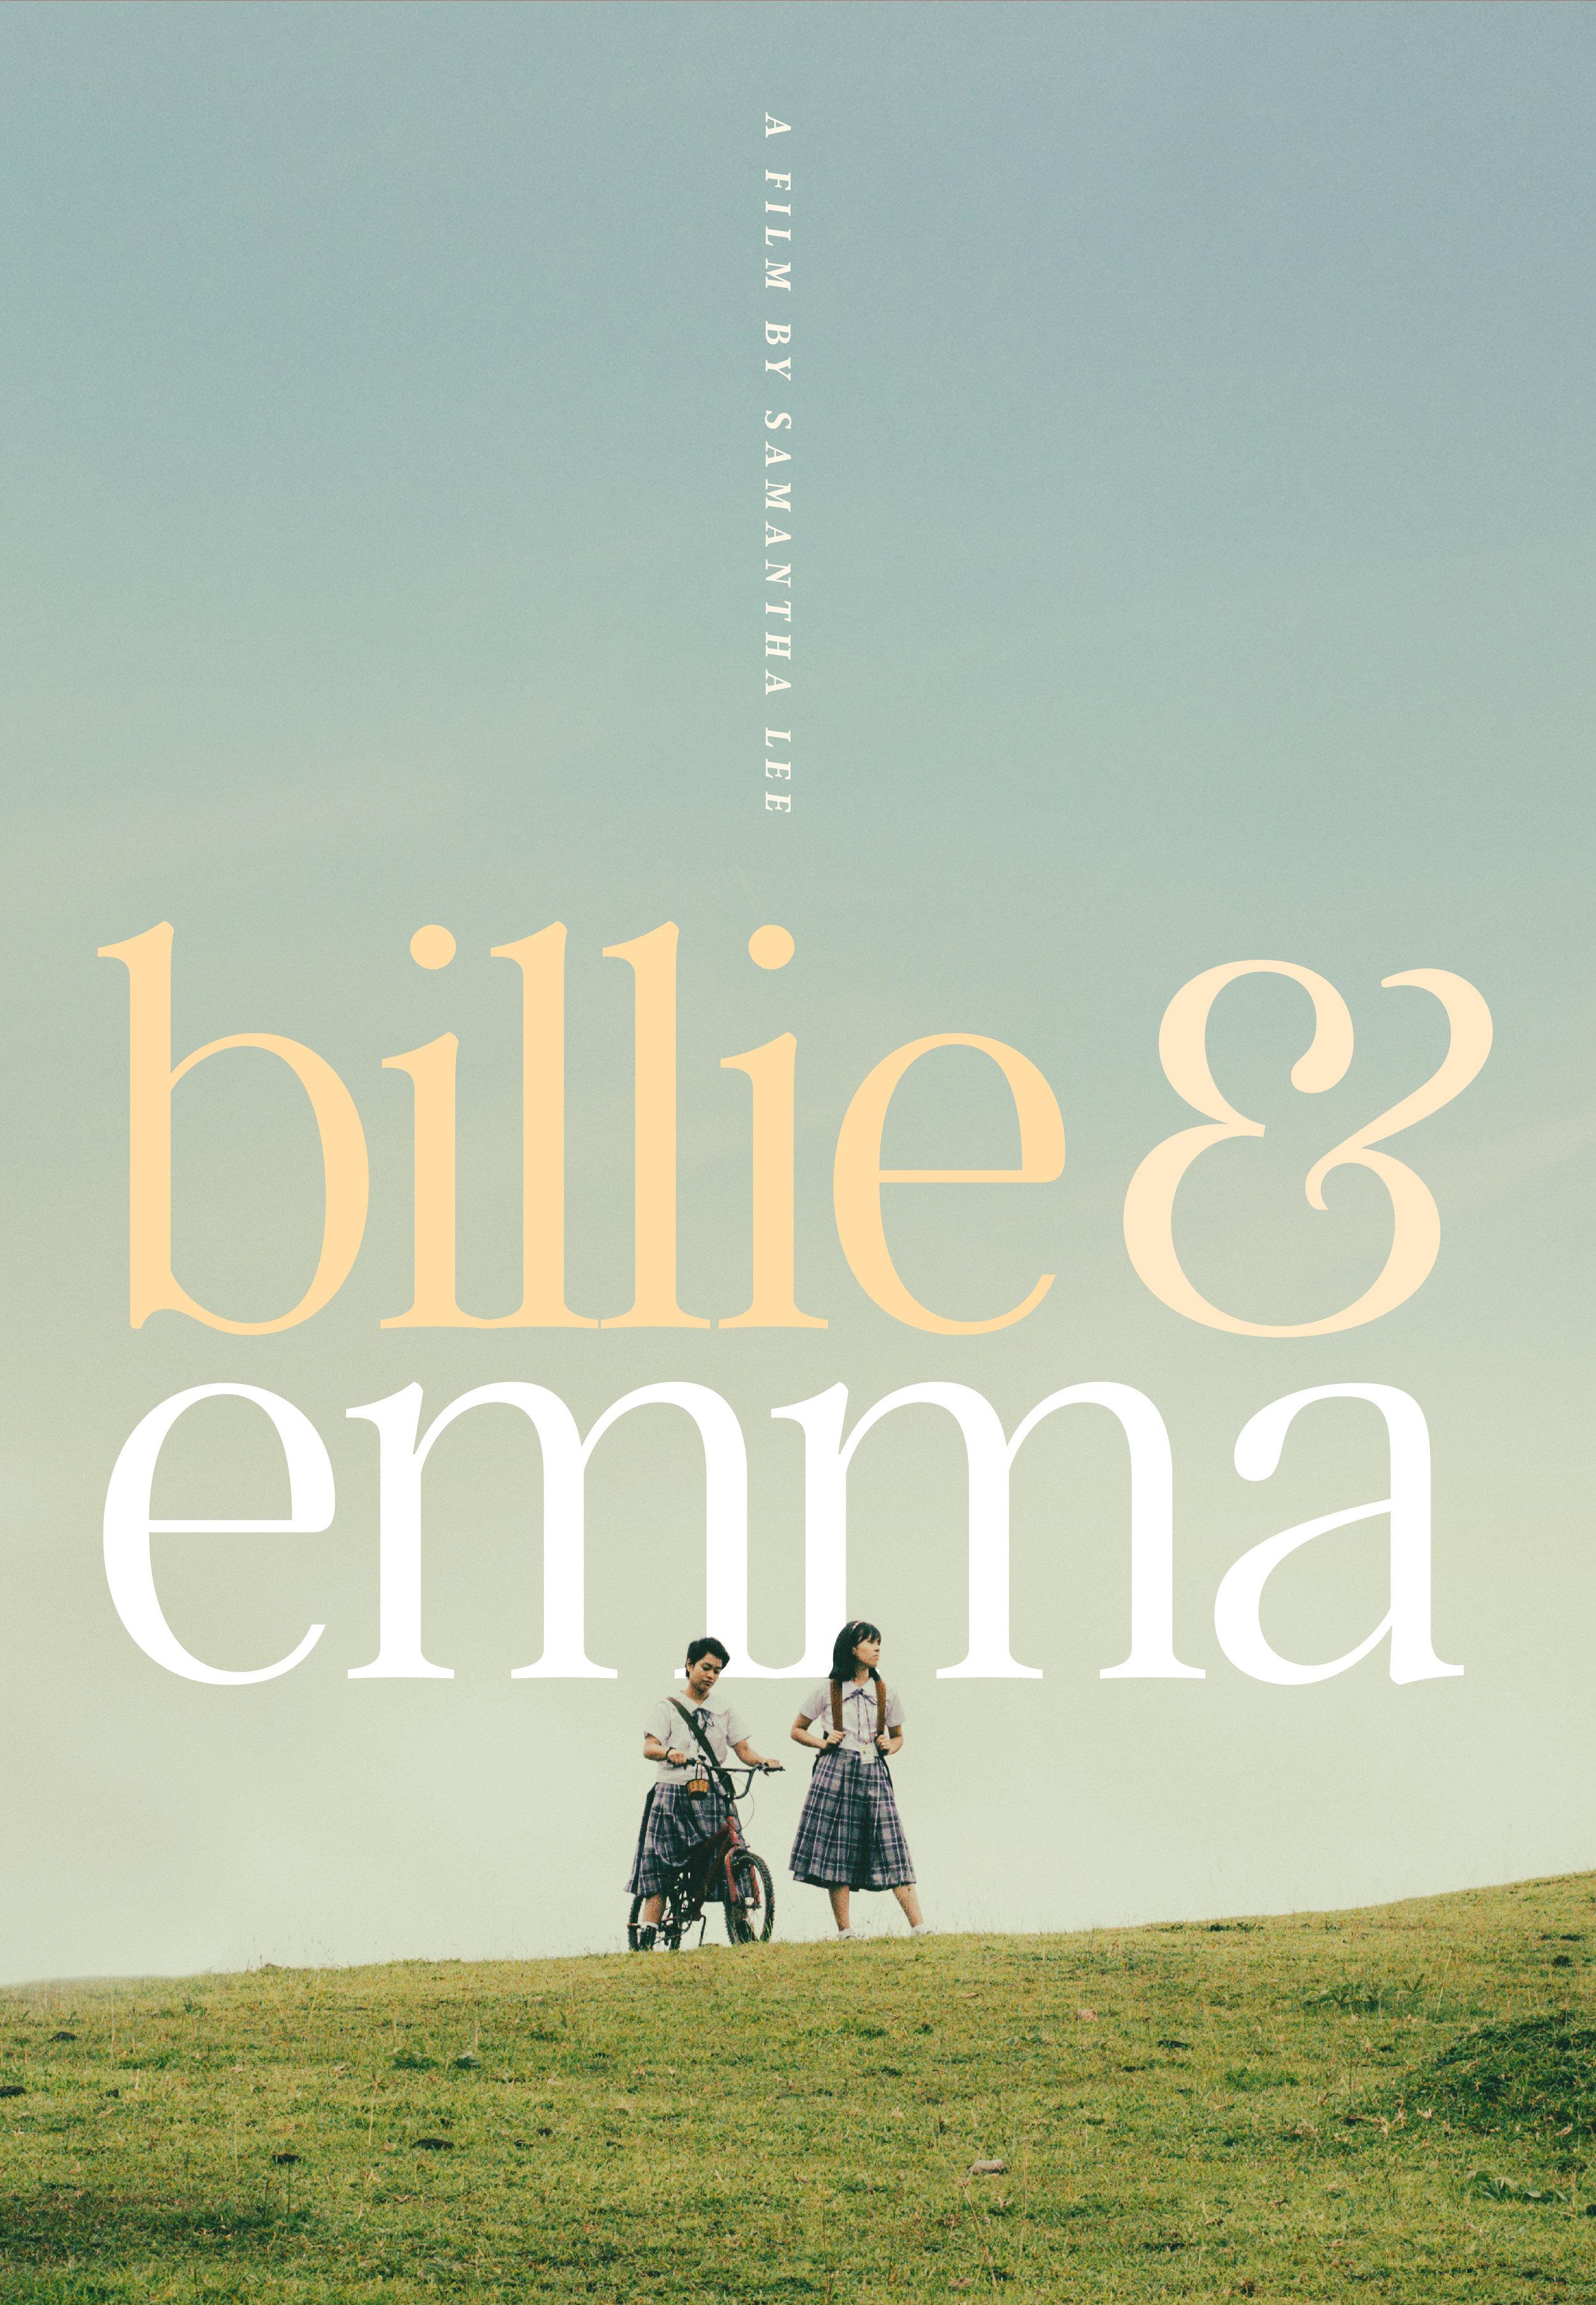 Billie & Emma   one-sheet, 2018.